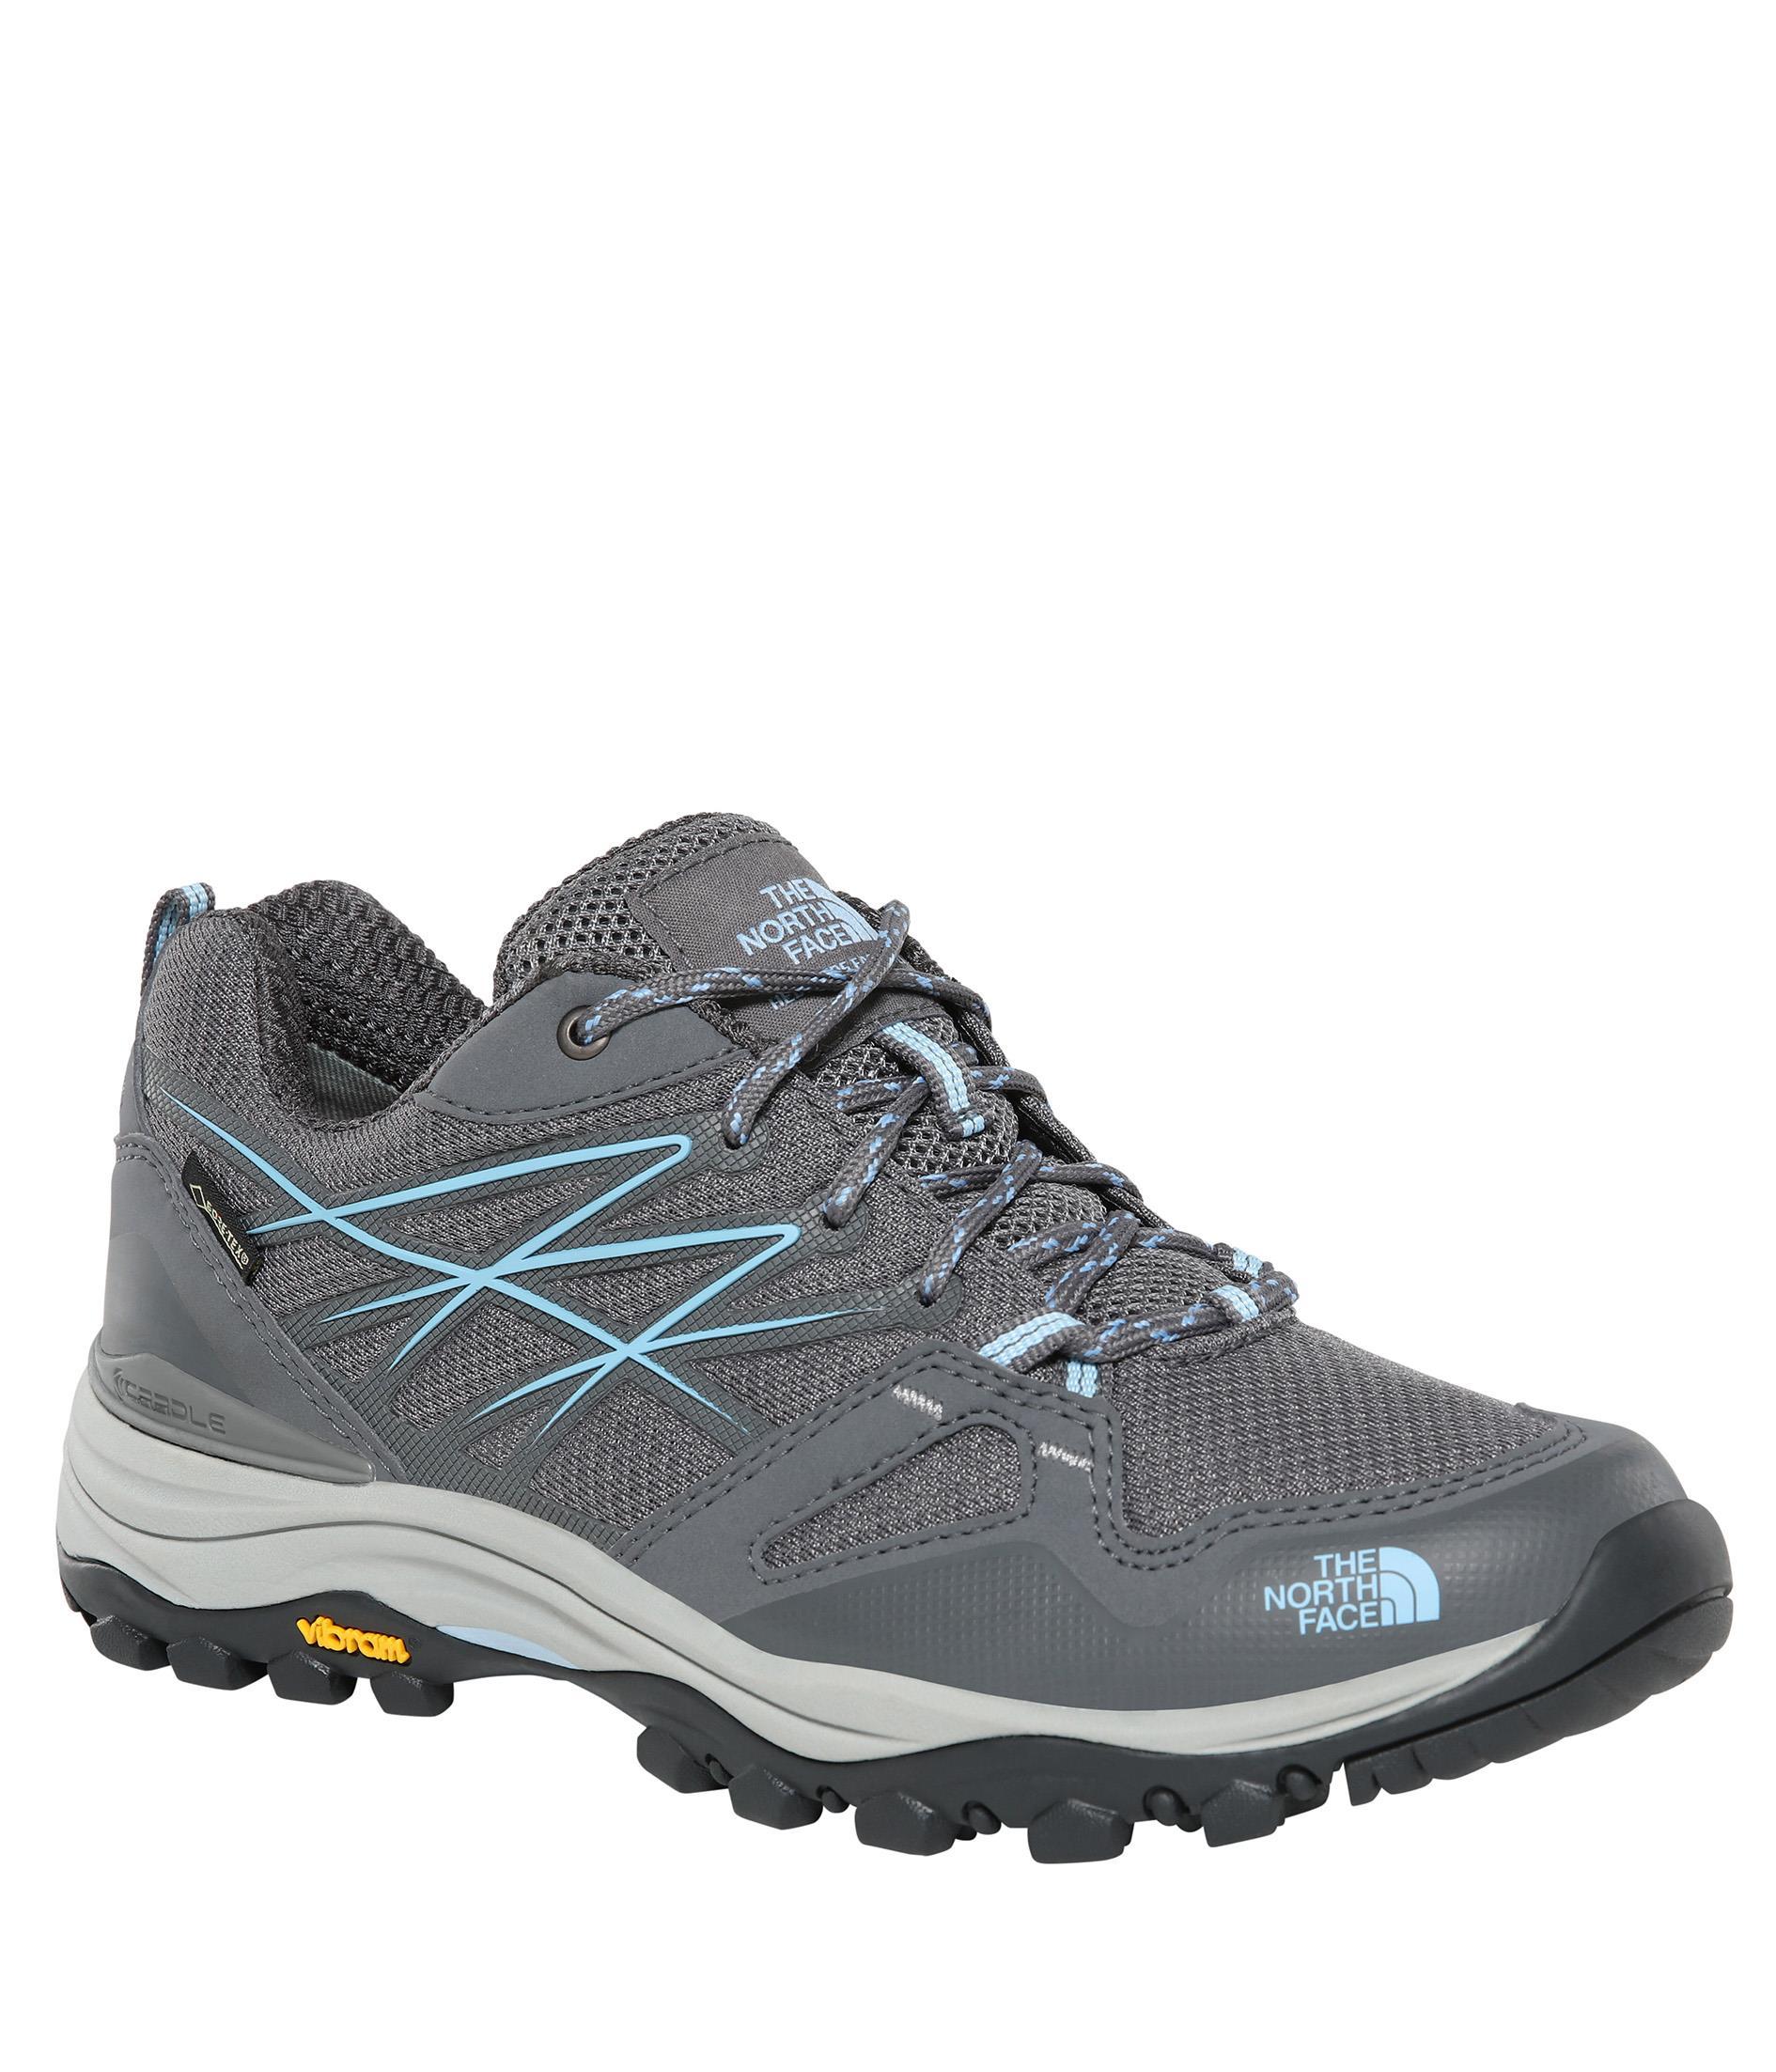 The North Face Kadın Hedgehg Fp Goretex (Eu) Nf00Cxt4H701 Ayakkabı